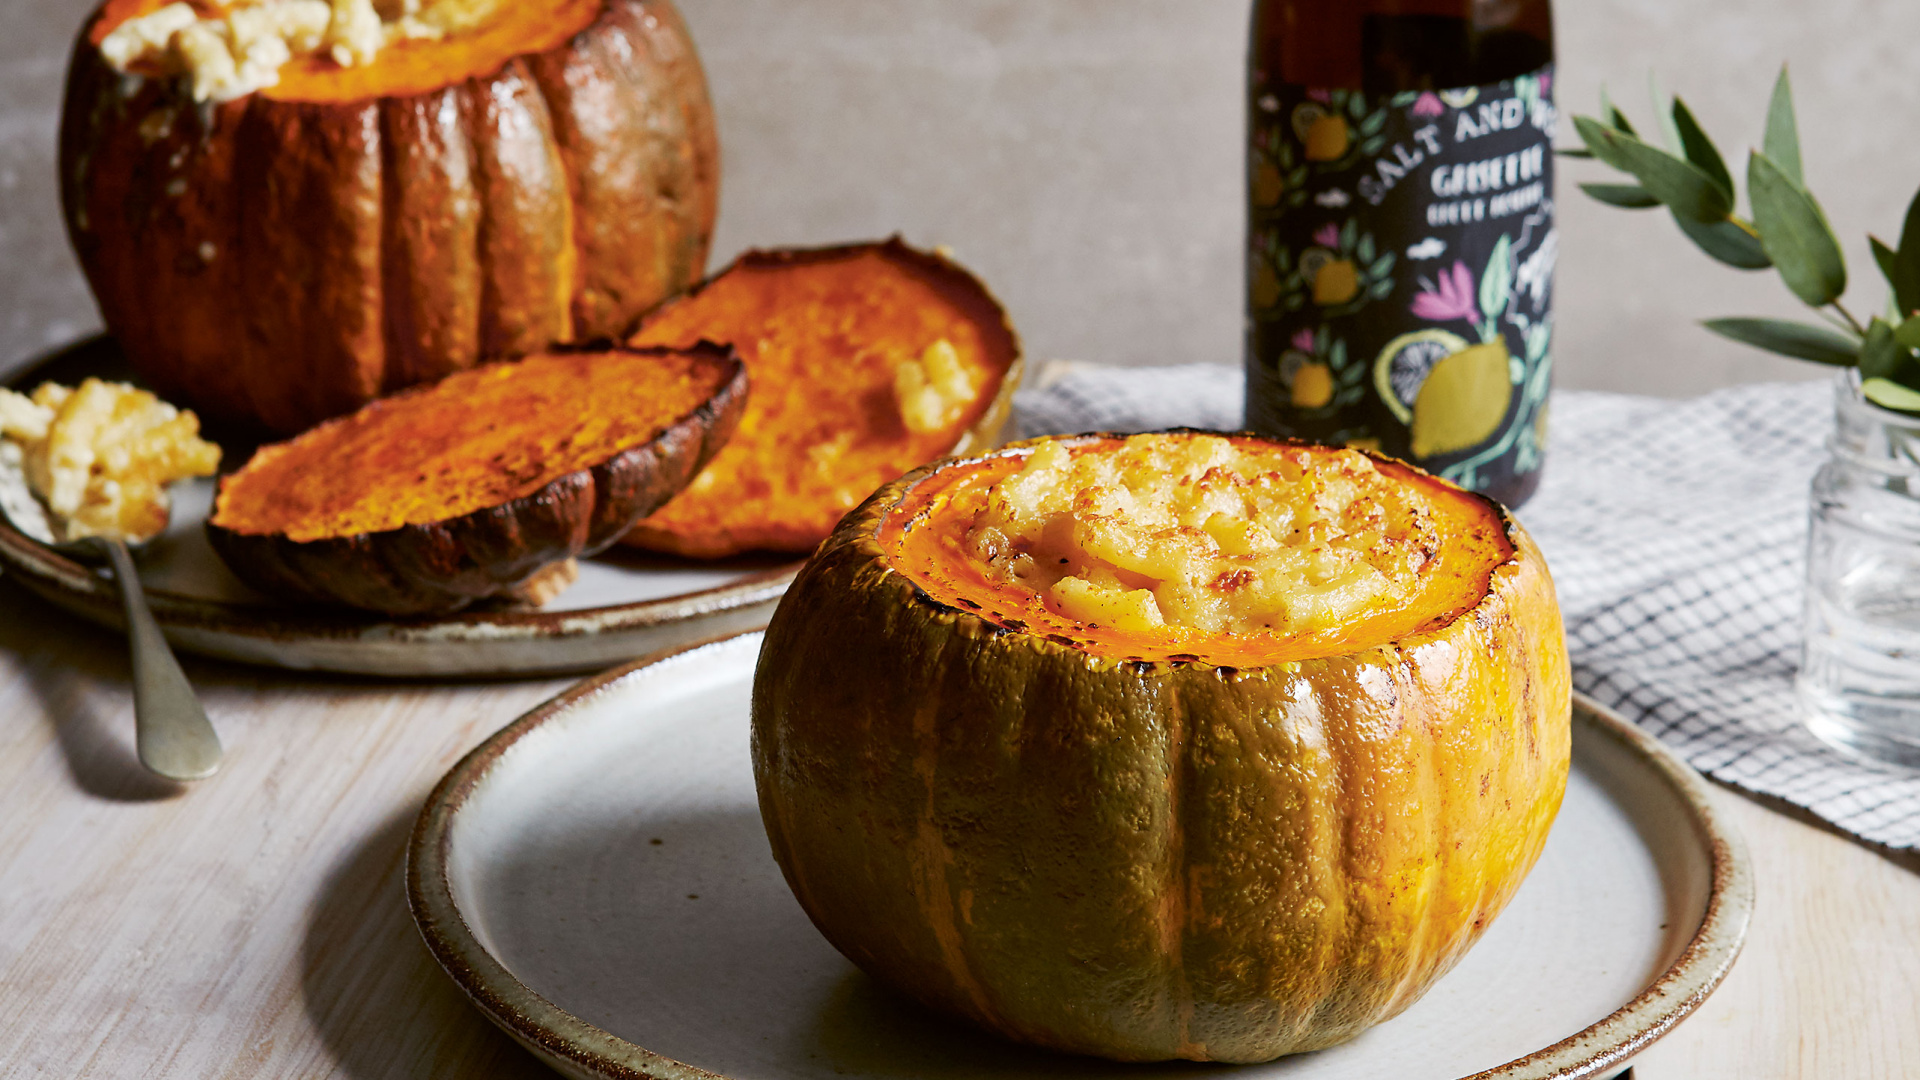 Melissa Cole's cheesy pasta pumpkin bowls